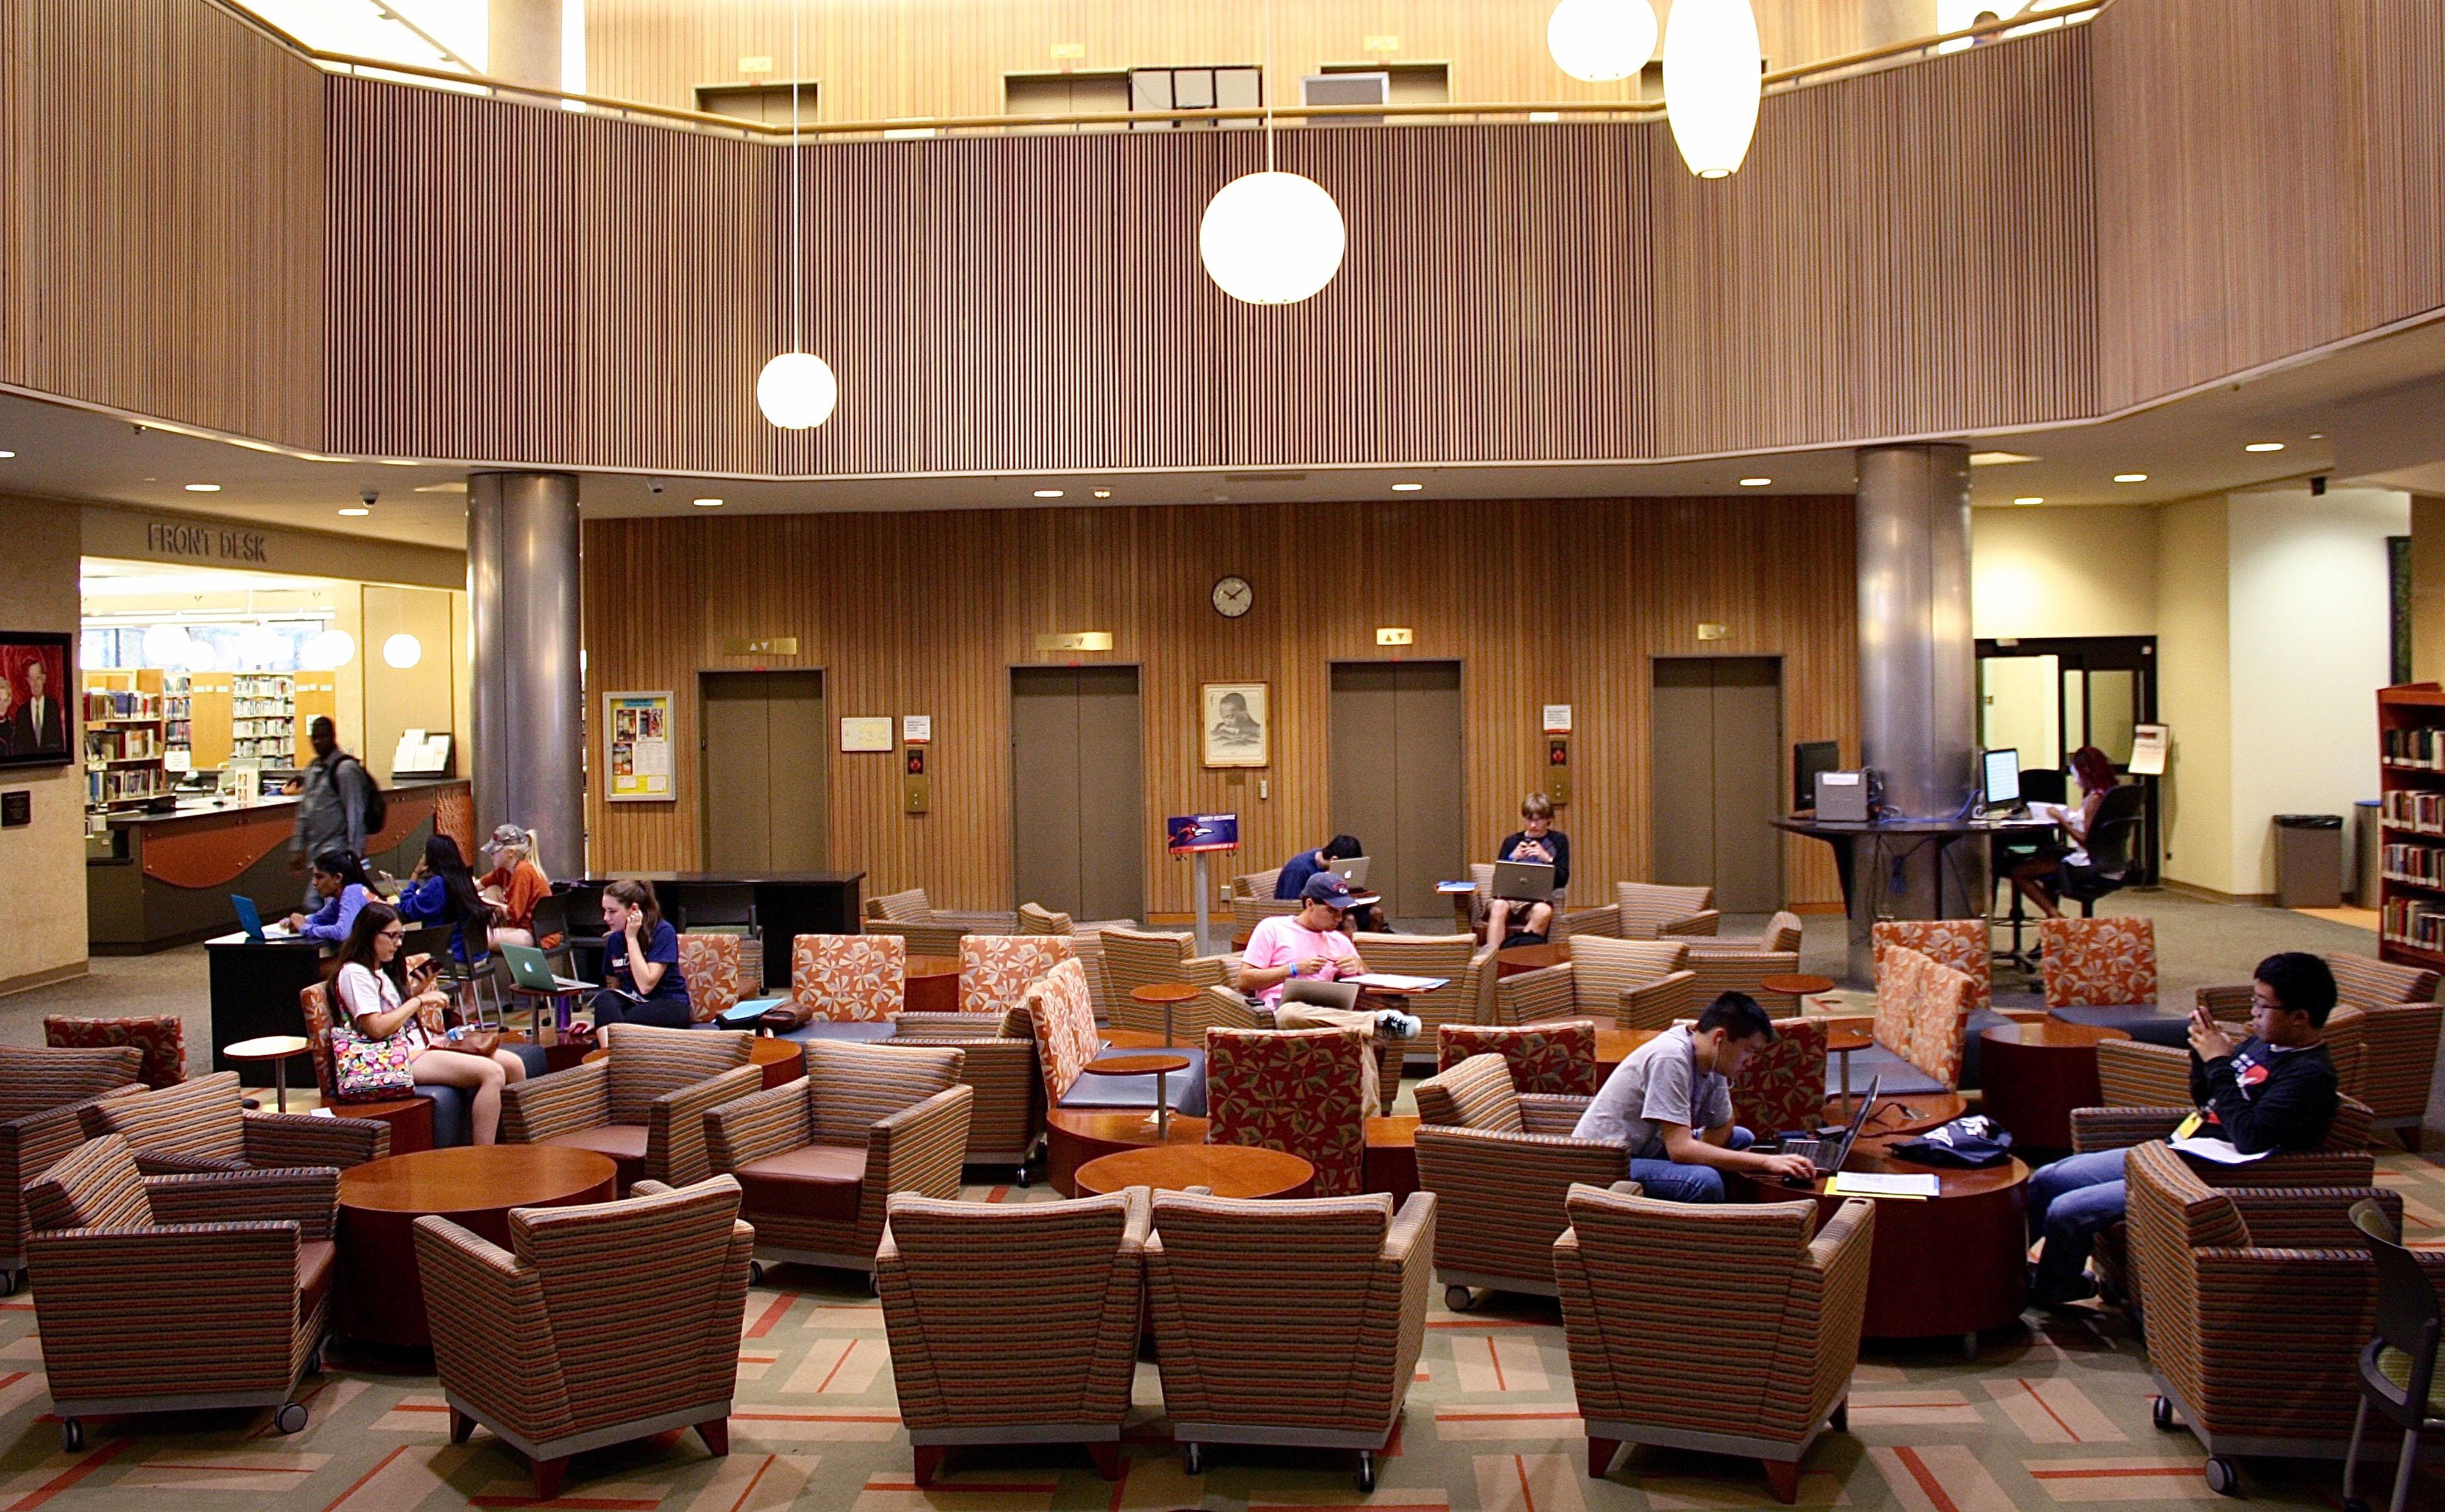 University Of Texas At San Antonio Libraries Wikipedia